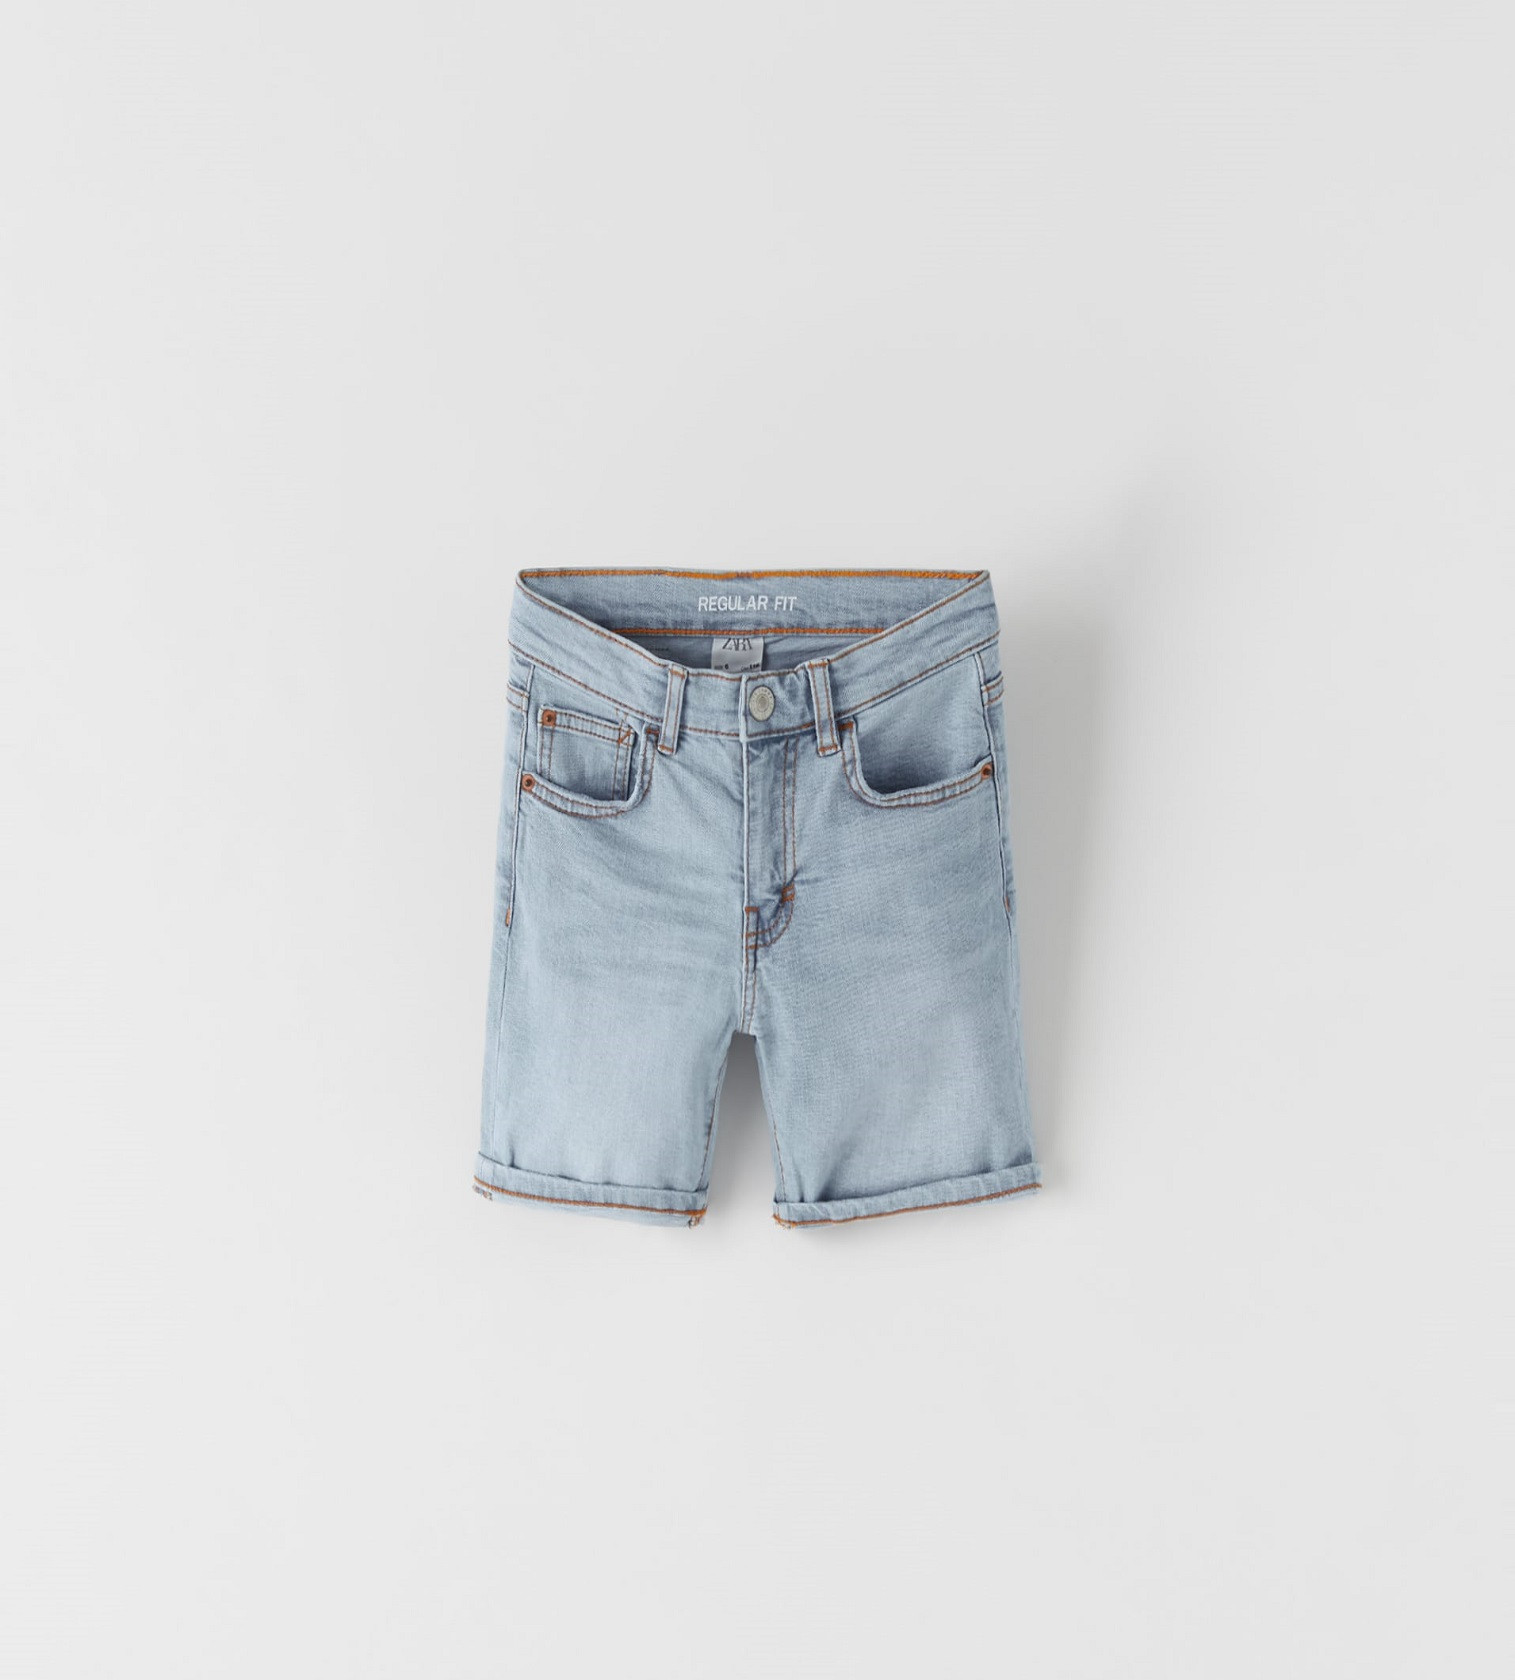 Купити Джинсові шорти Zara BLEACH WASH DENIM BERMUDA - фото 1